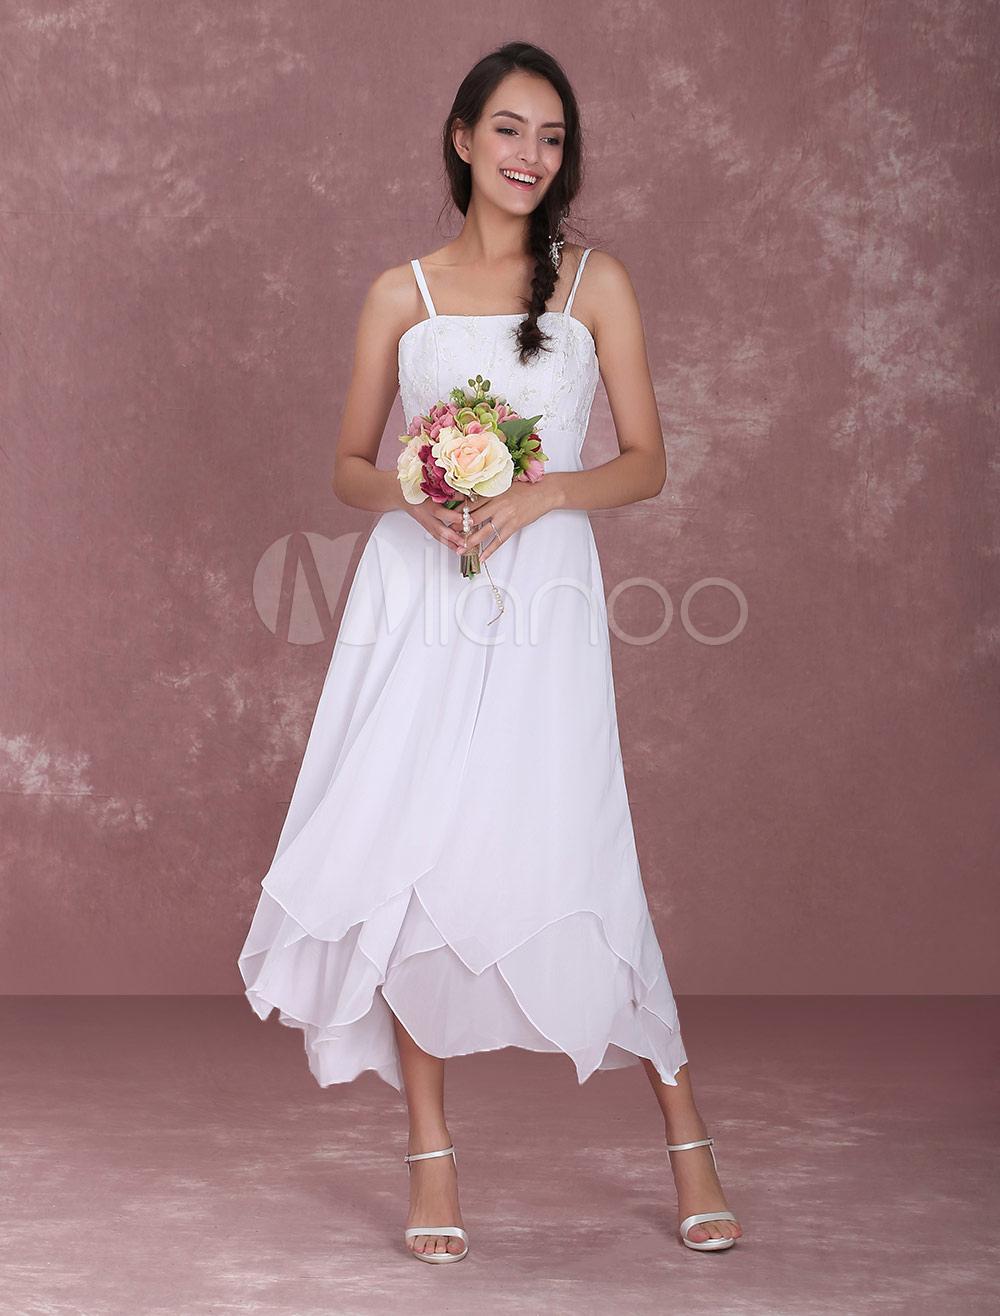 White Wedding Gown Straps Embroidered Tiered Ruffles Wedding Dress (Cheap Wedding Dress) photo